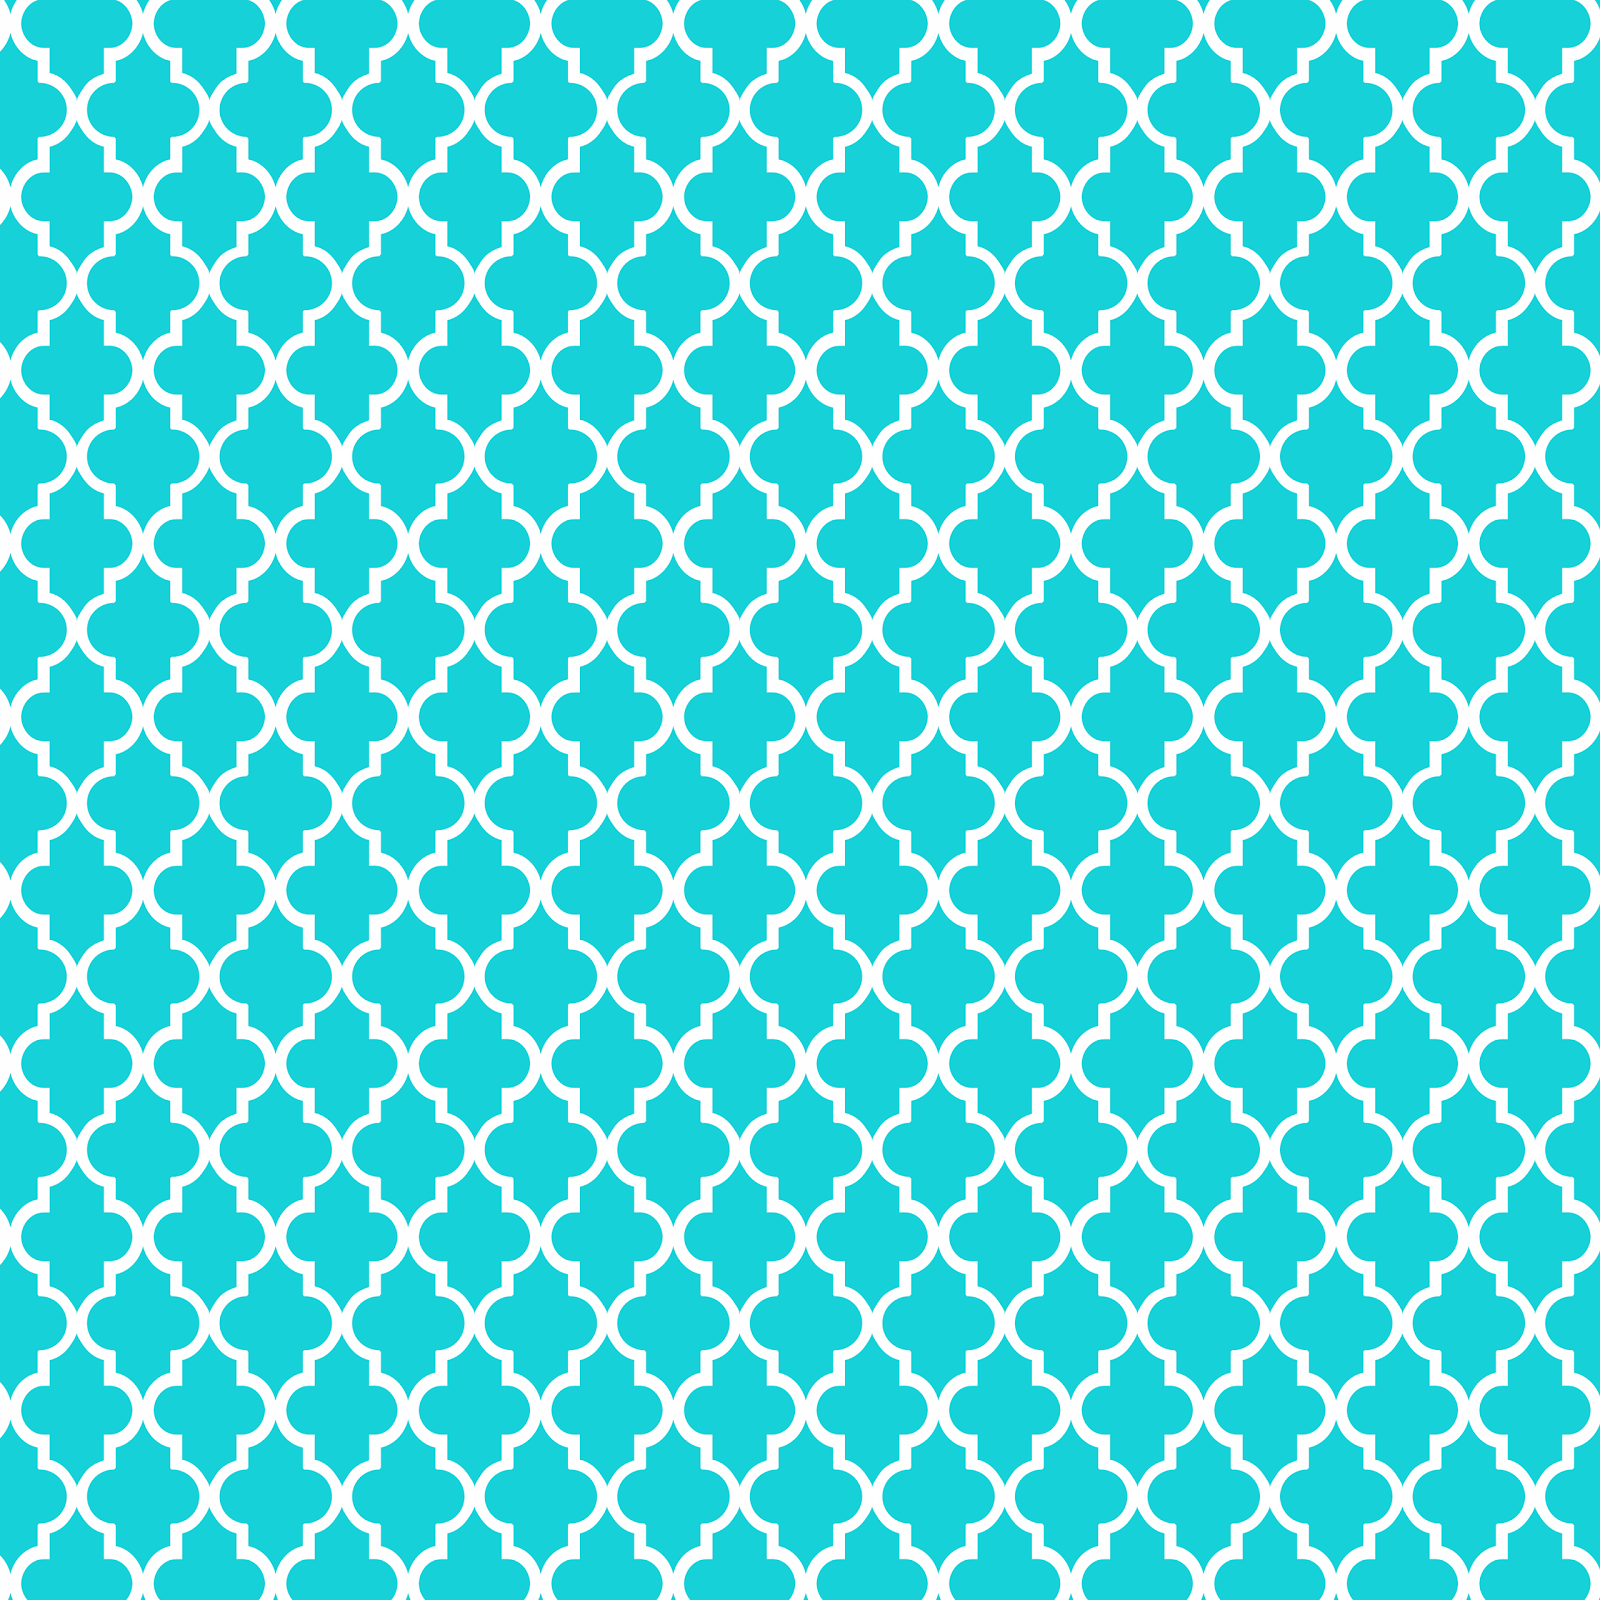 More FREE printable patterns!   Free printable, Patterns and Free